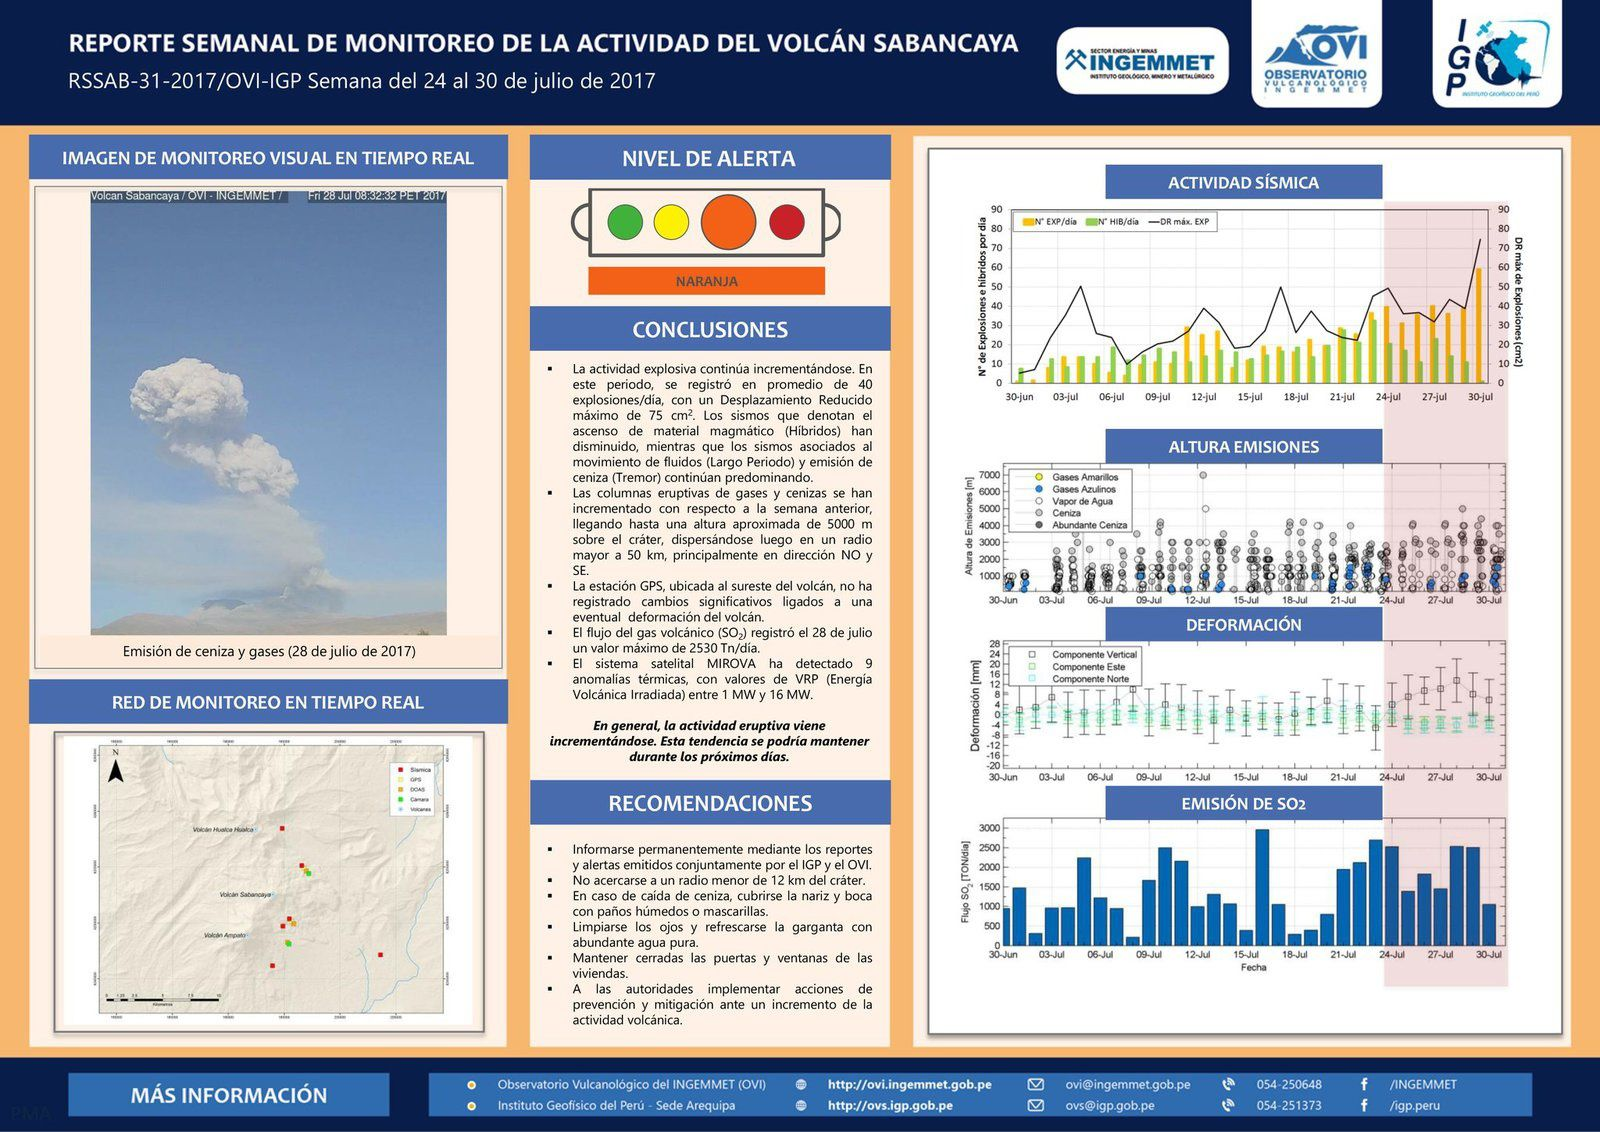 Sabancaya - summary table of activities between 24 and 30 July 2017 - Doc. IGPeru / OVI-Ingemmet